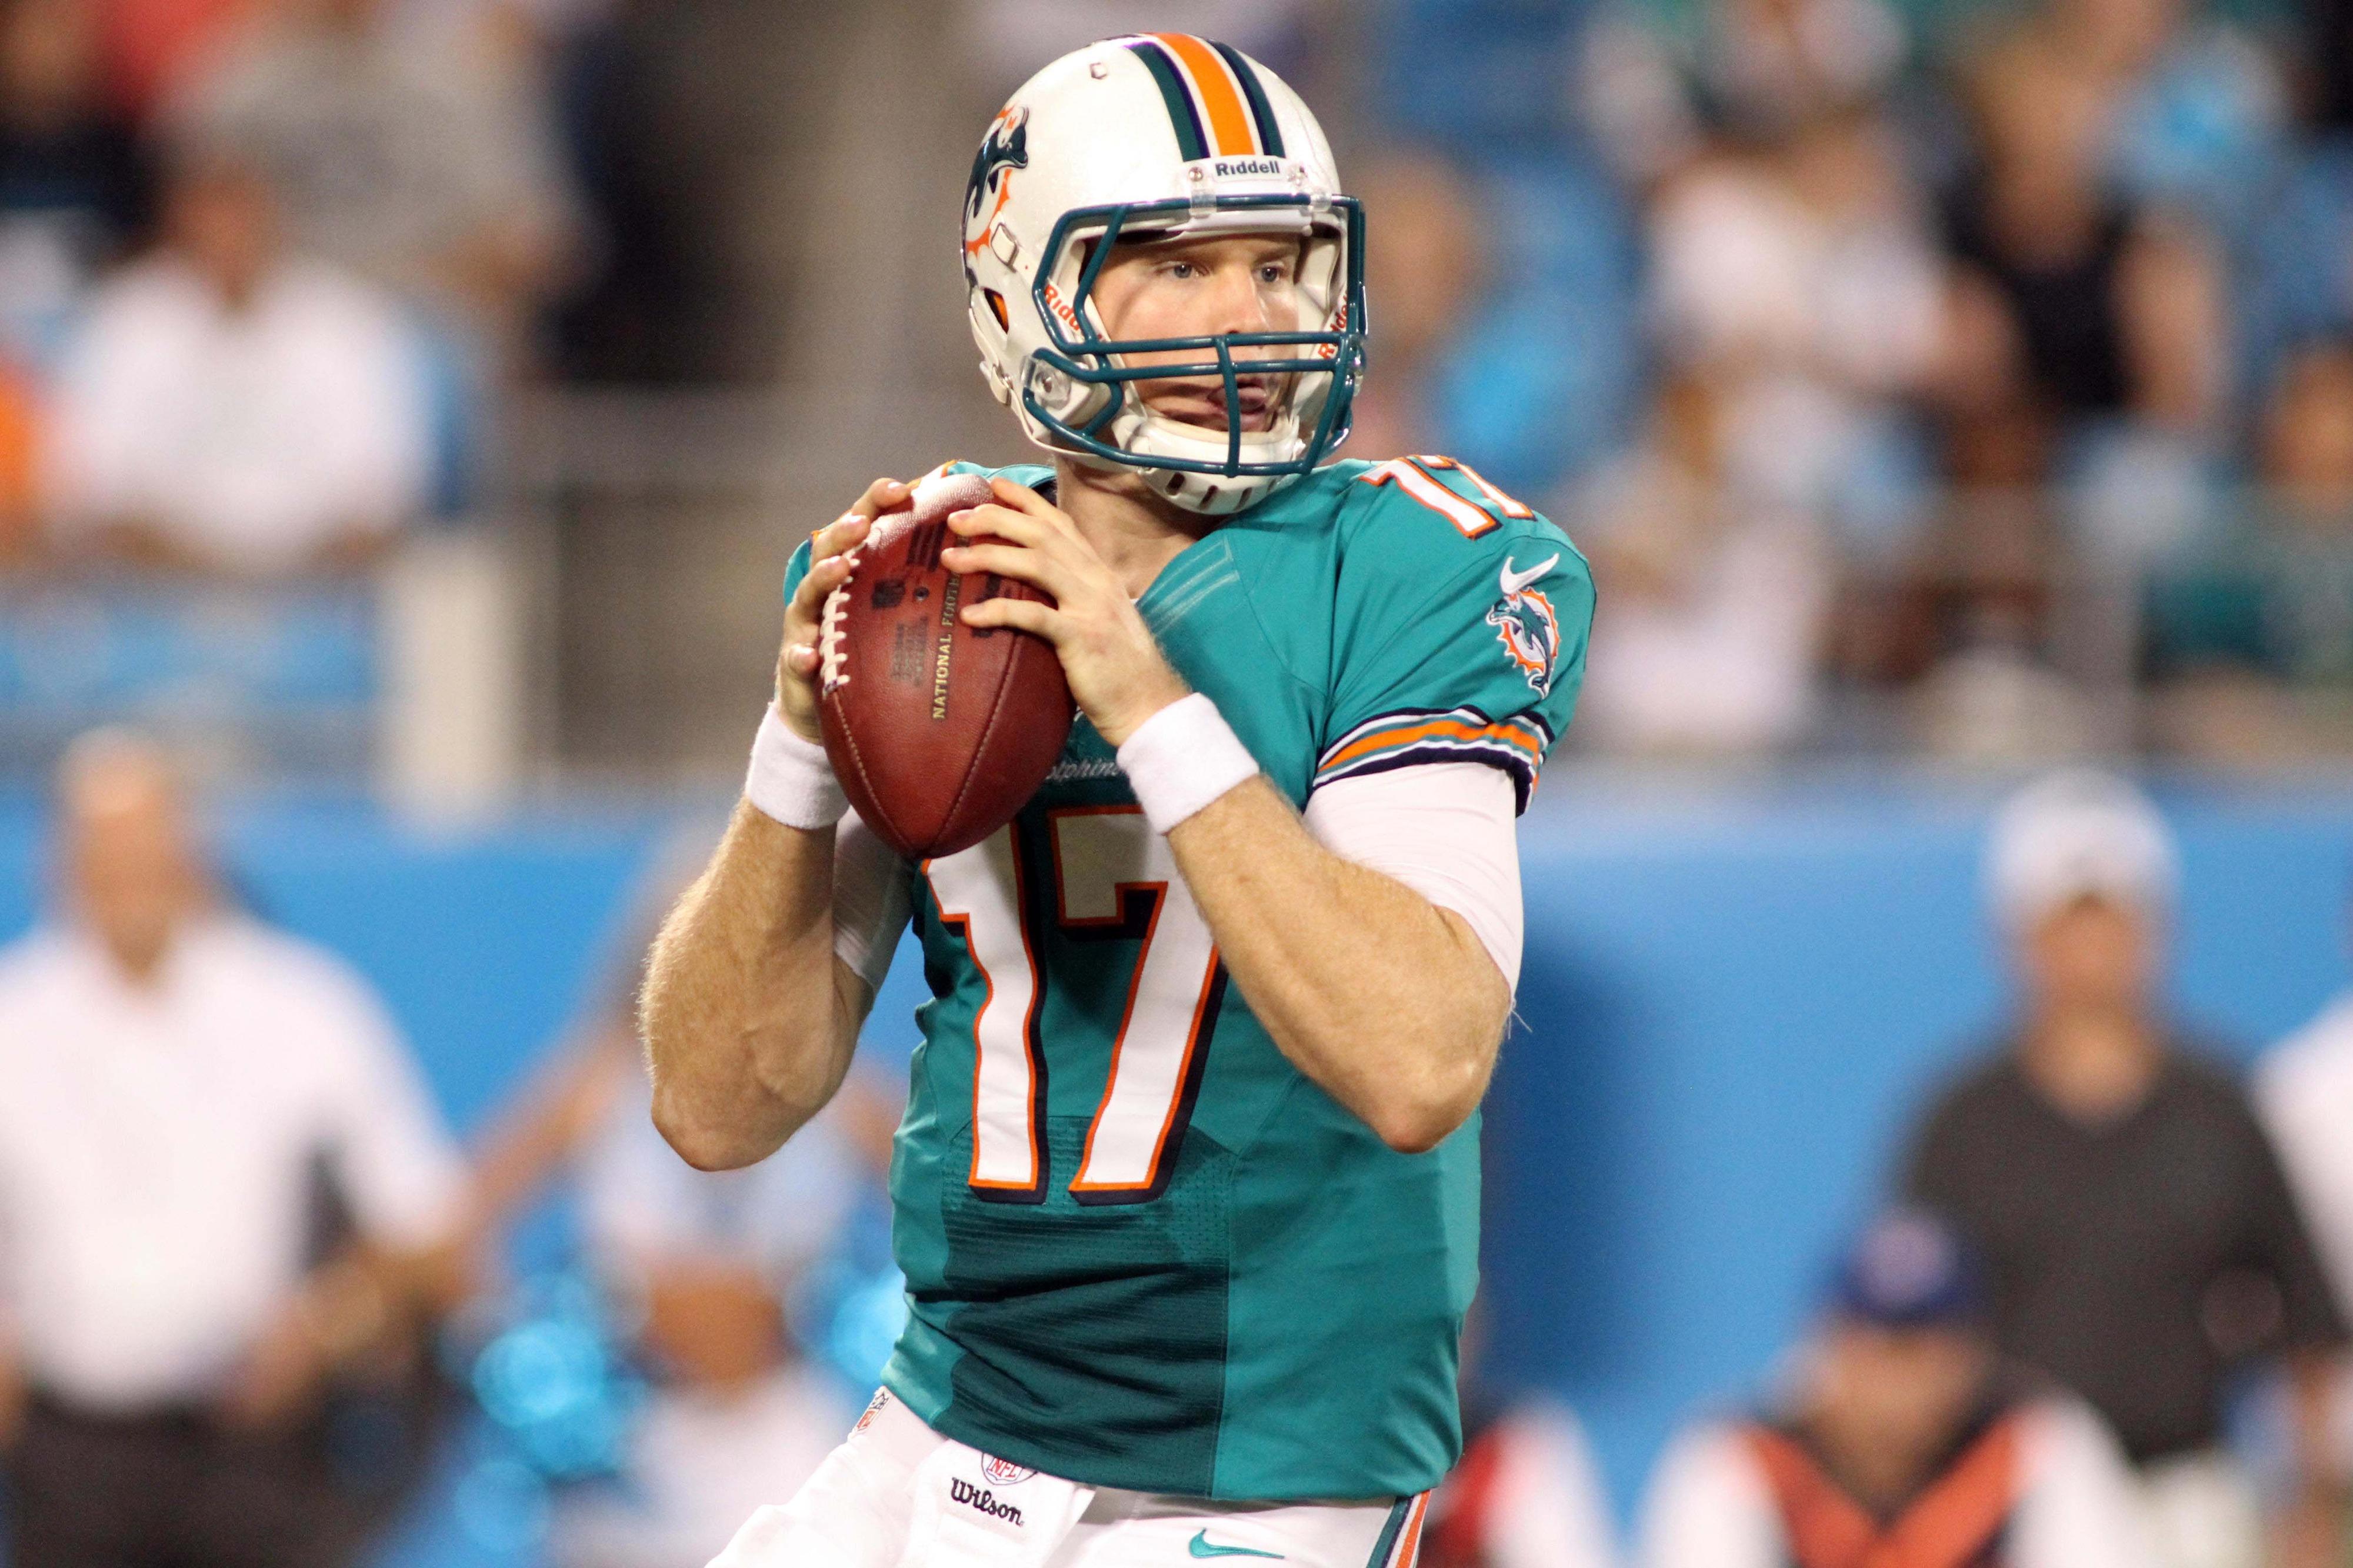 Miami Dolphins starting quarterback Ryan Tannehill took center stage in this week's <em>Hard Knocks</em> episode.